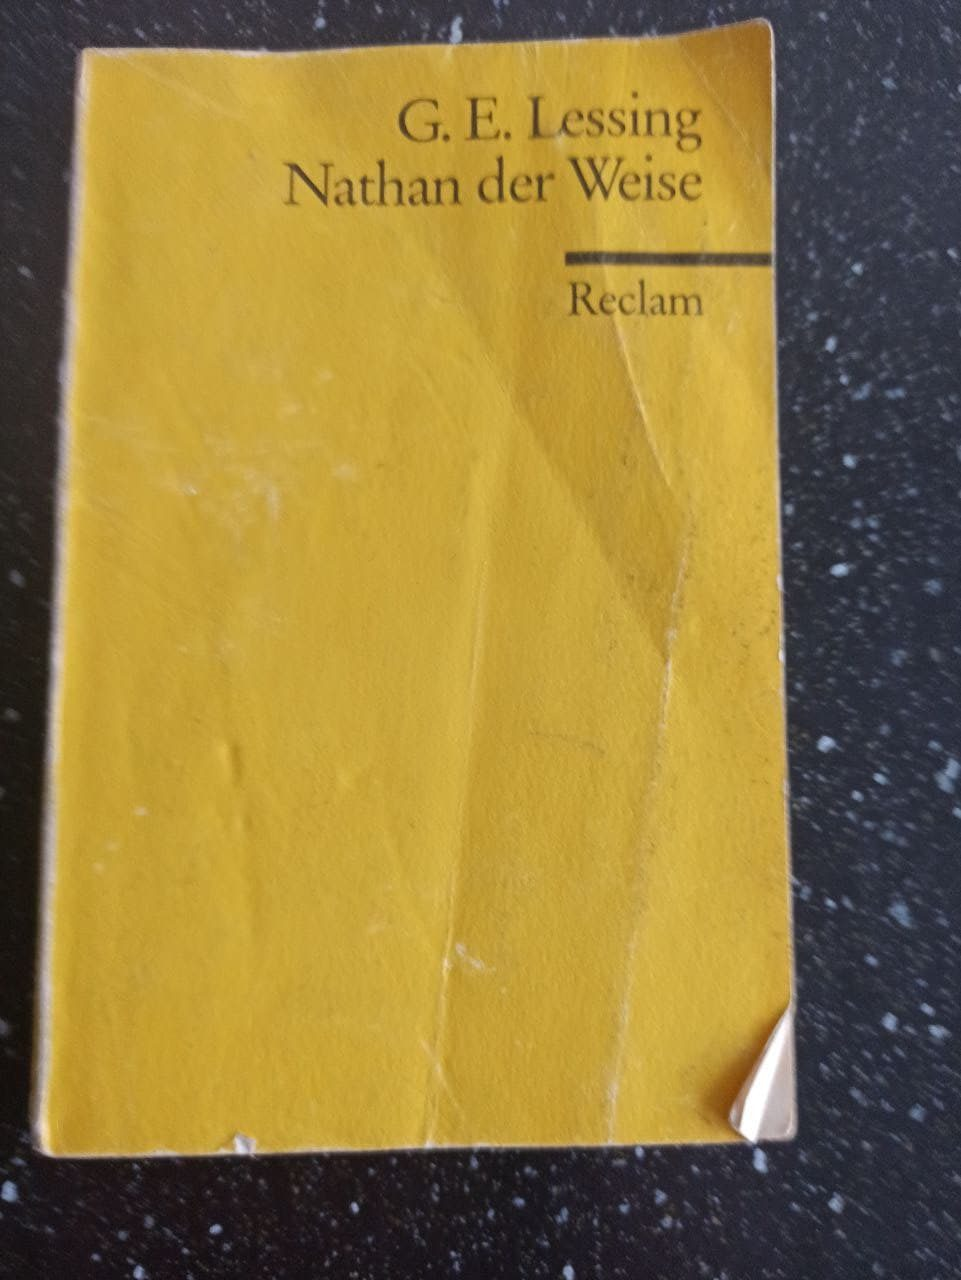 Nathan der Weise ~ Gotthold Ephraim Lessing